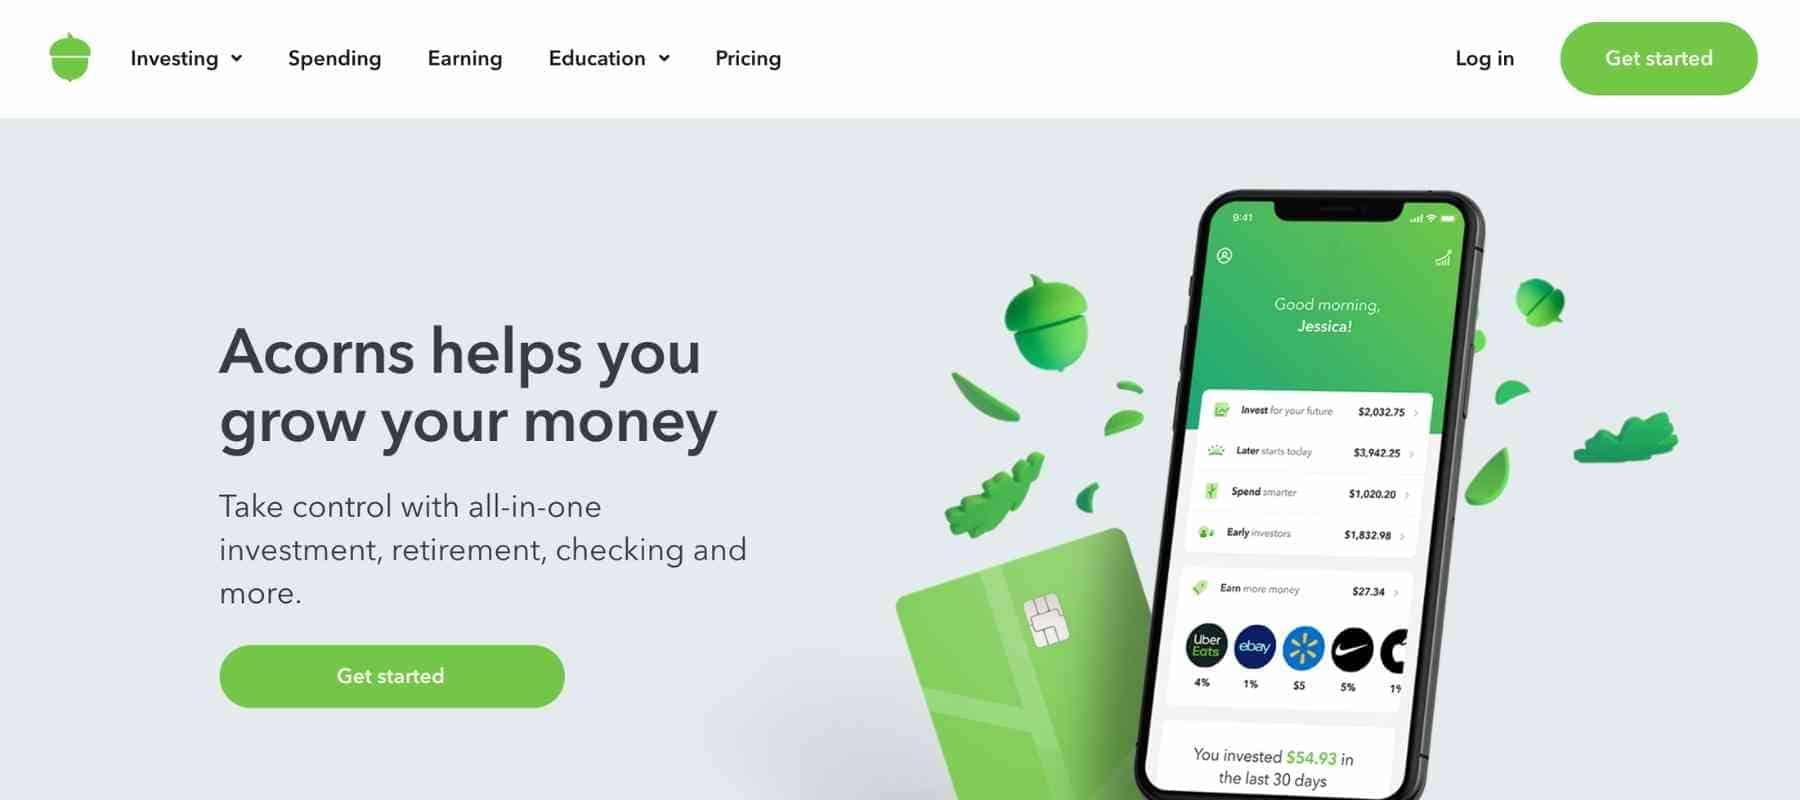 Best Passive Income Apps - Acorns